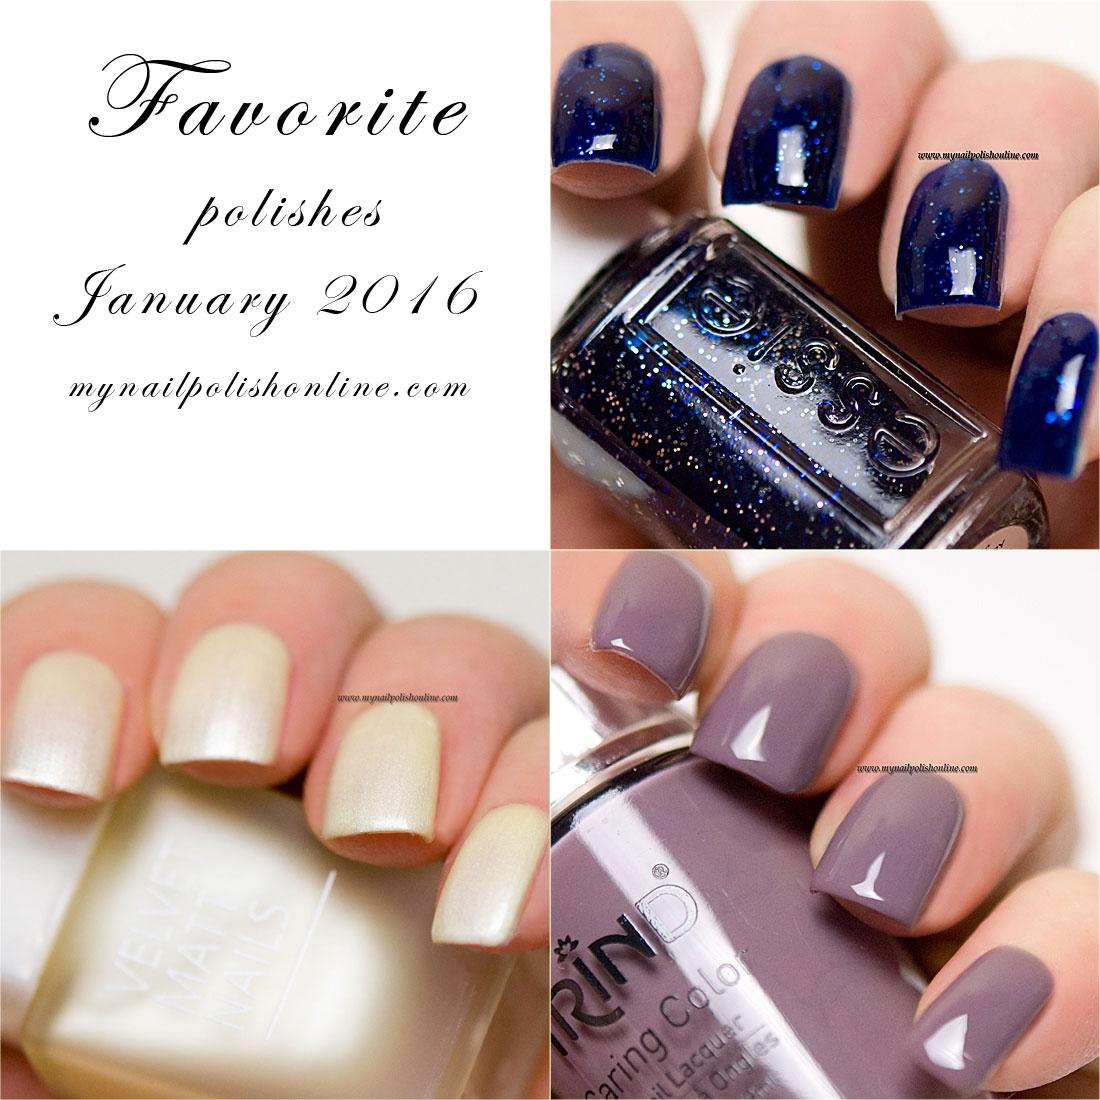 Favorite polishes January 2016